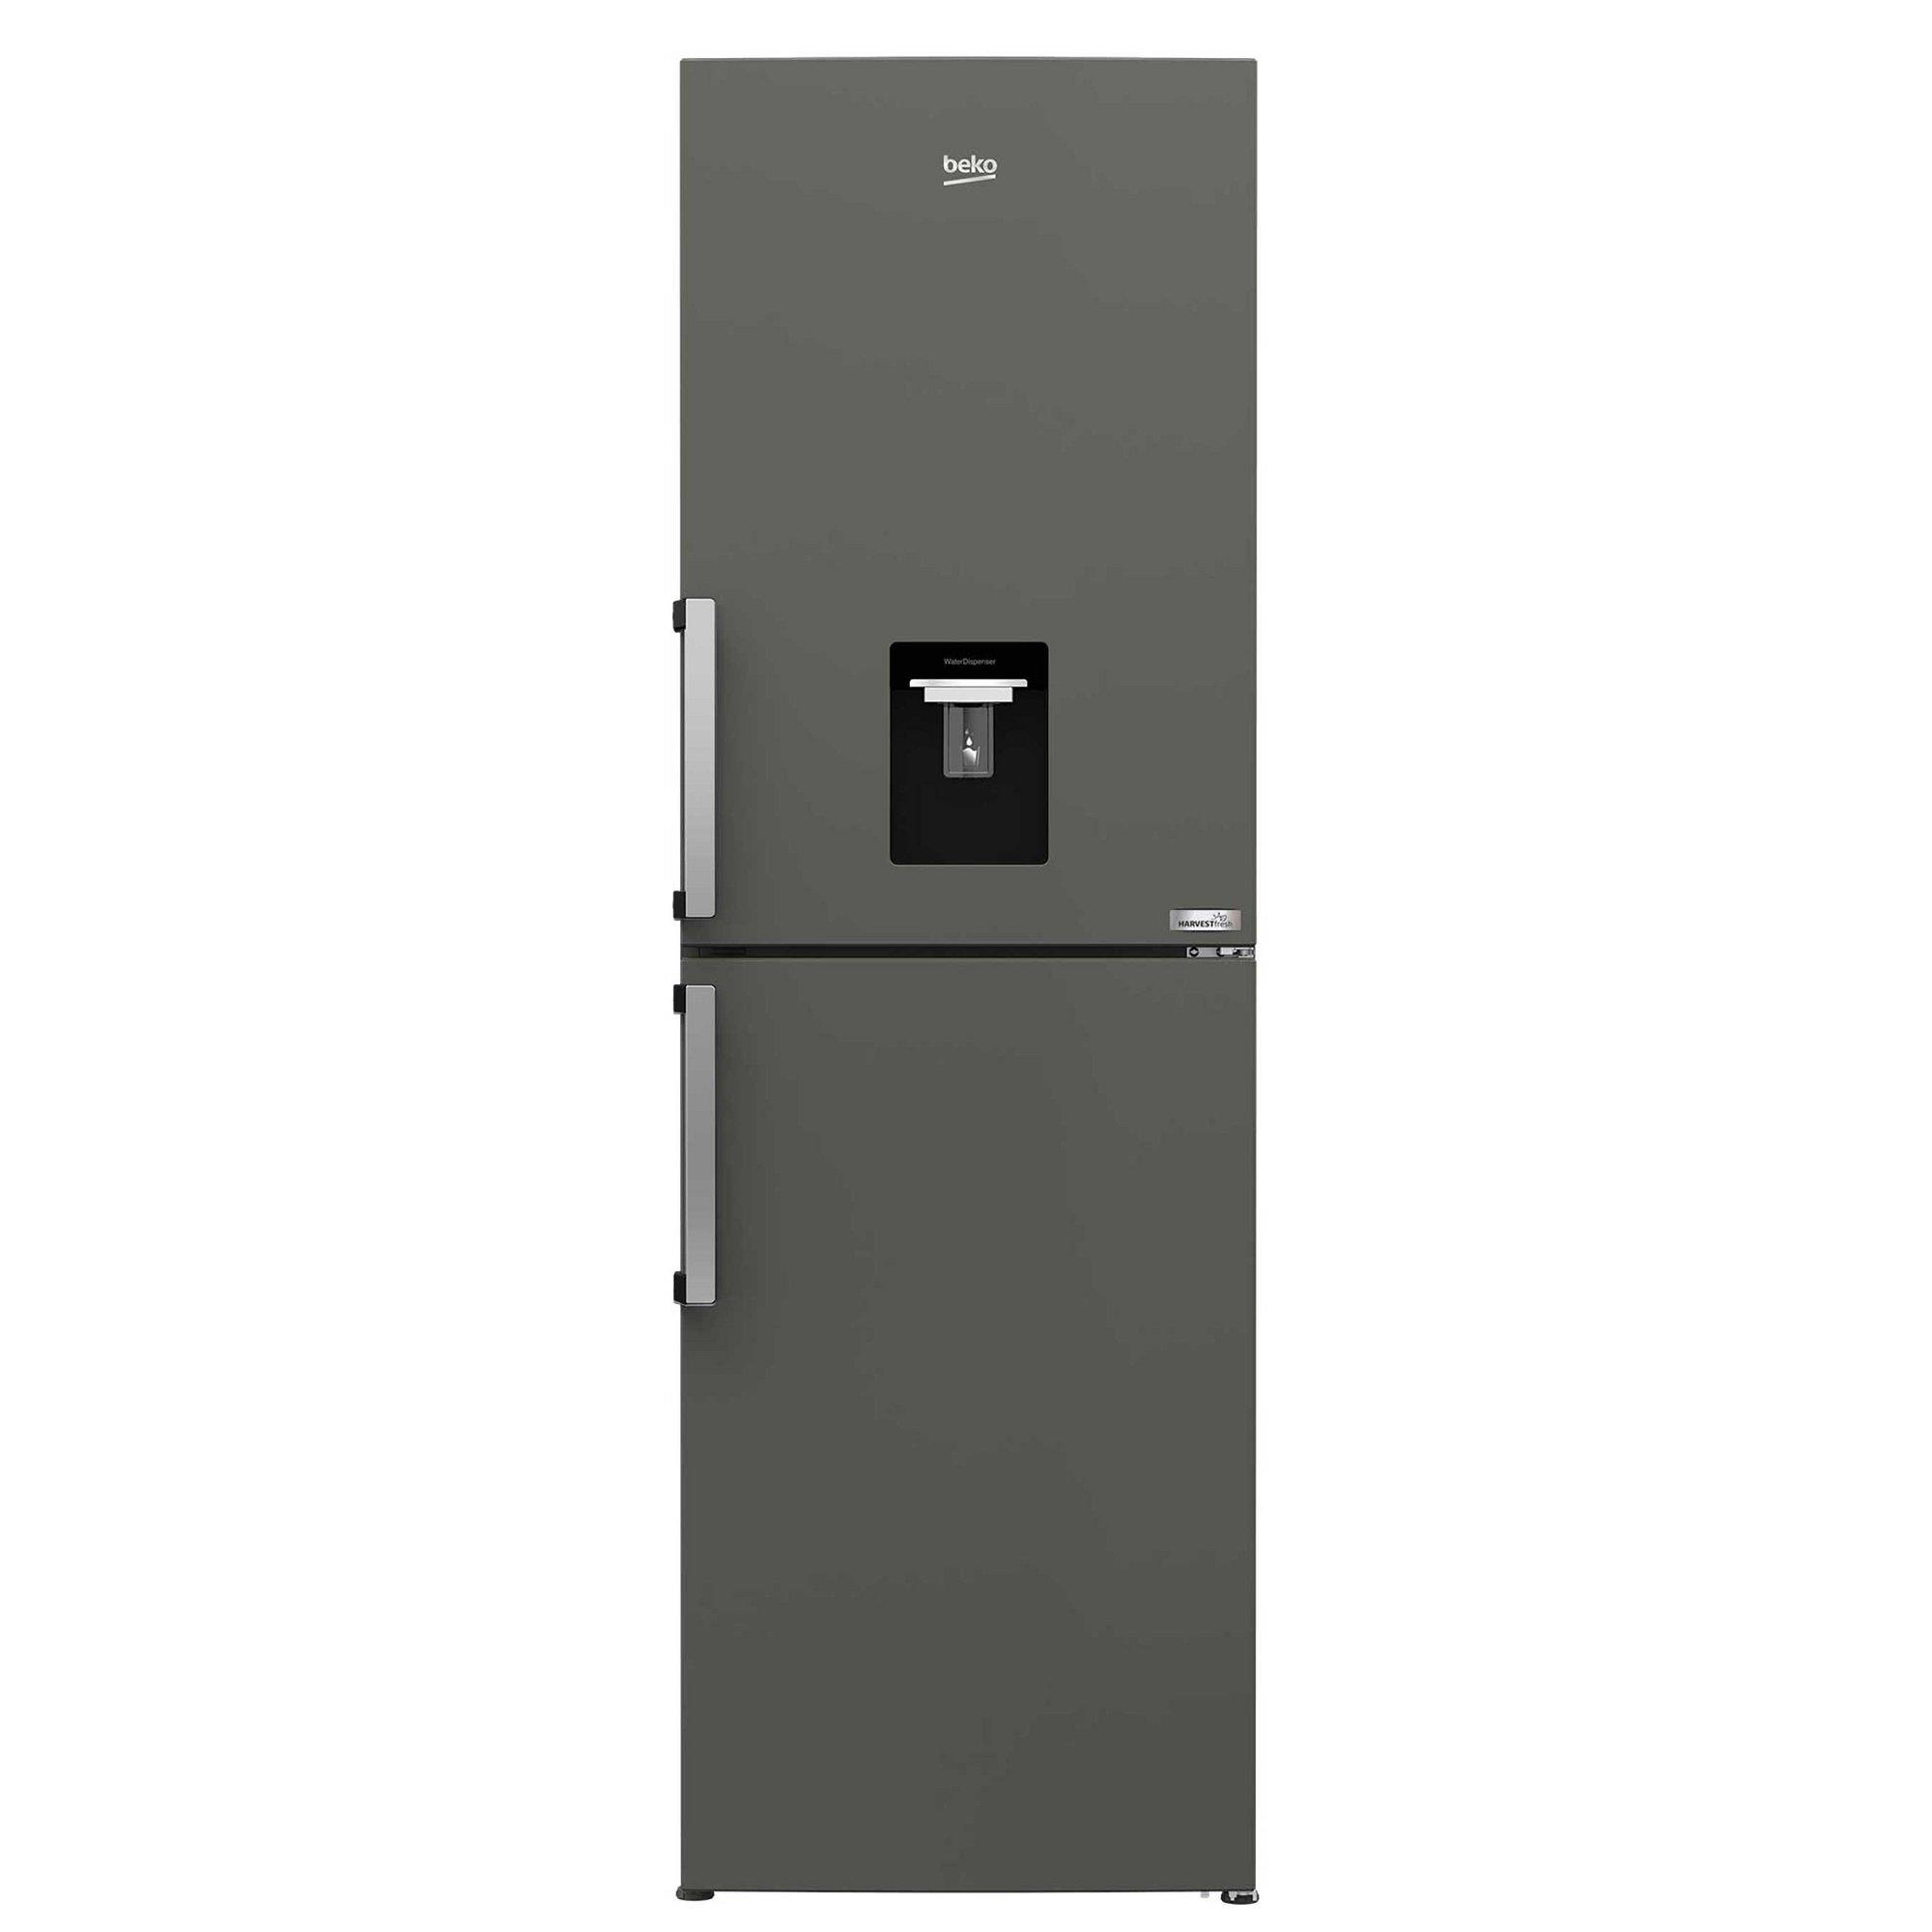 Image of Beko 191/60cm Frost Free Fridge Freezer with Water Dispenser